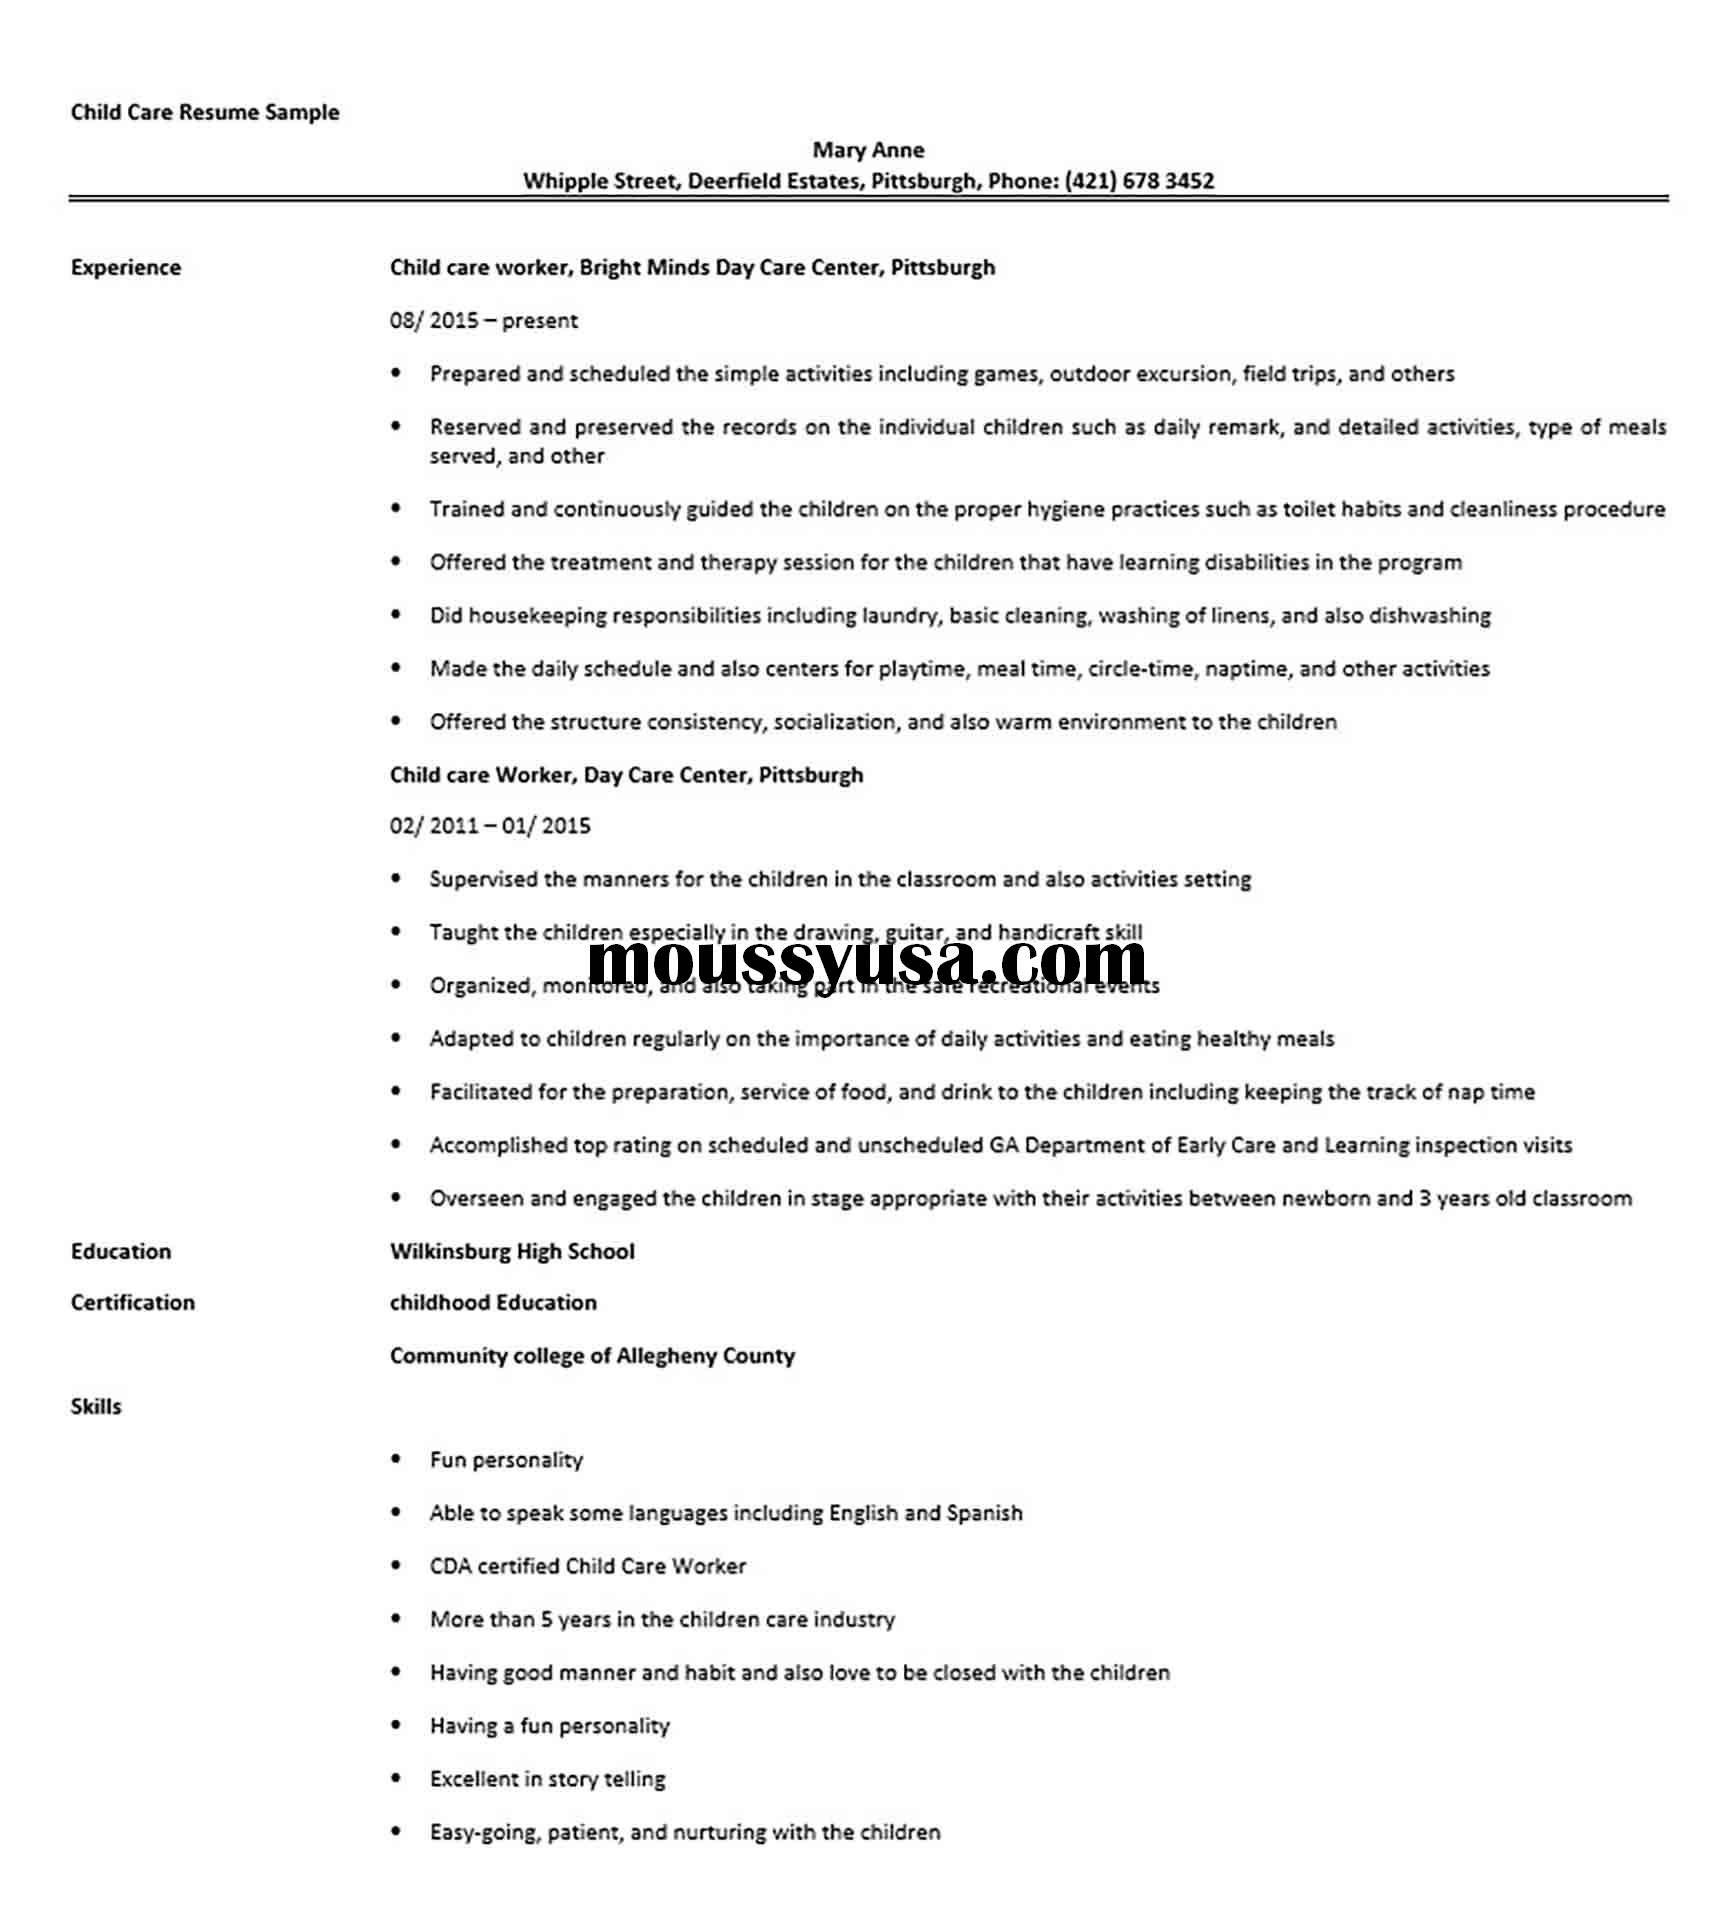 Child Care Resume Sample Childcare Child Care Worker Resume